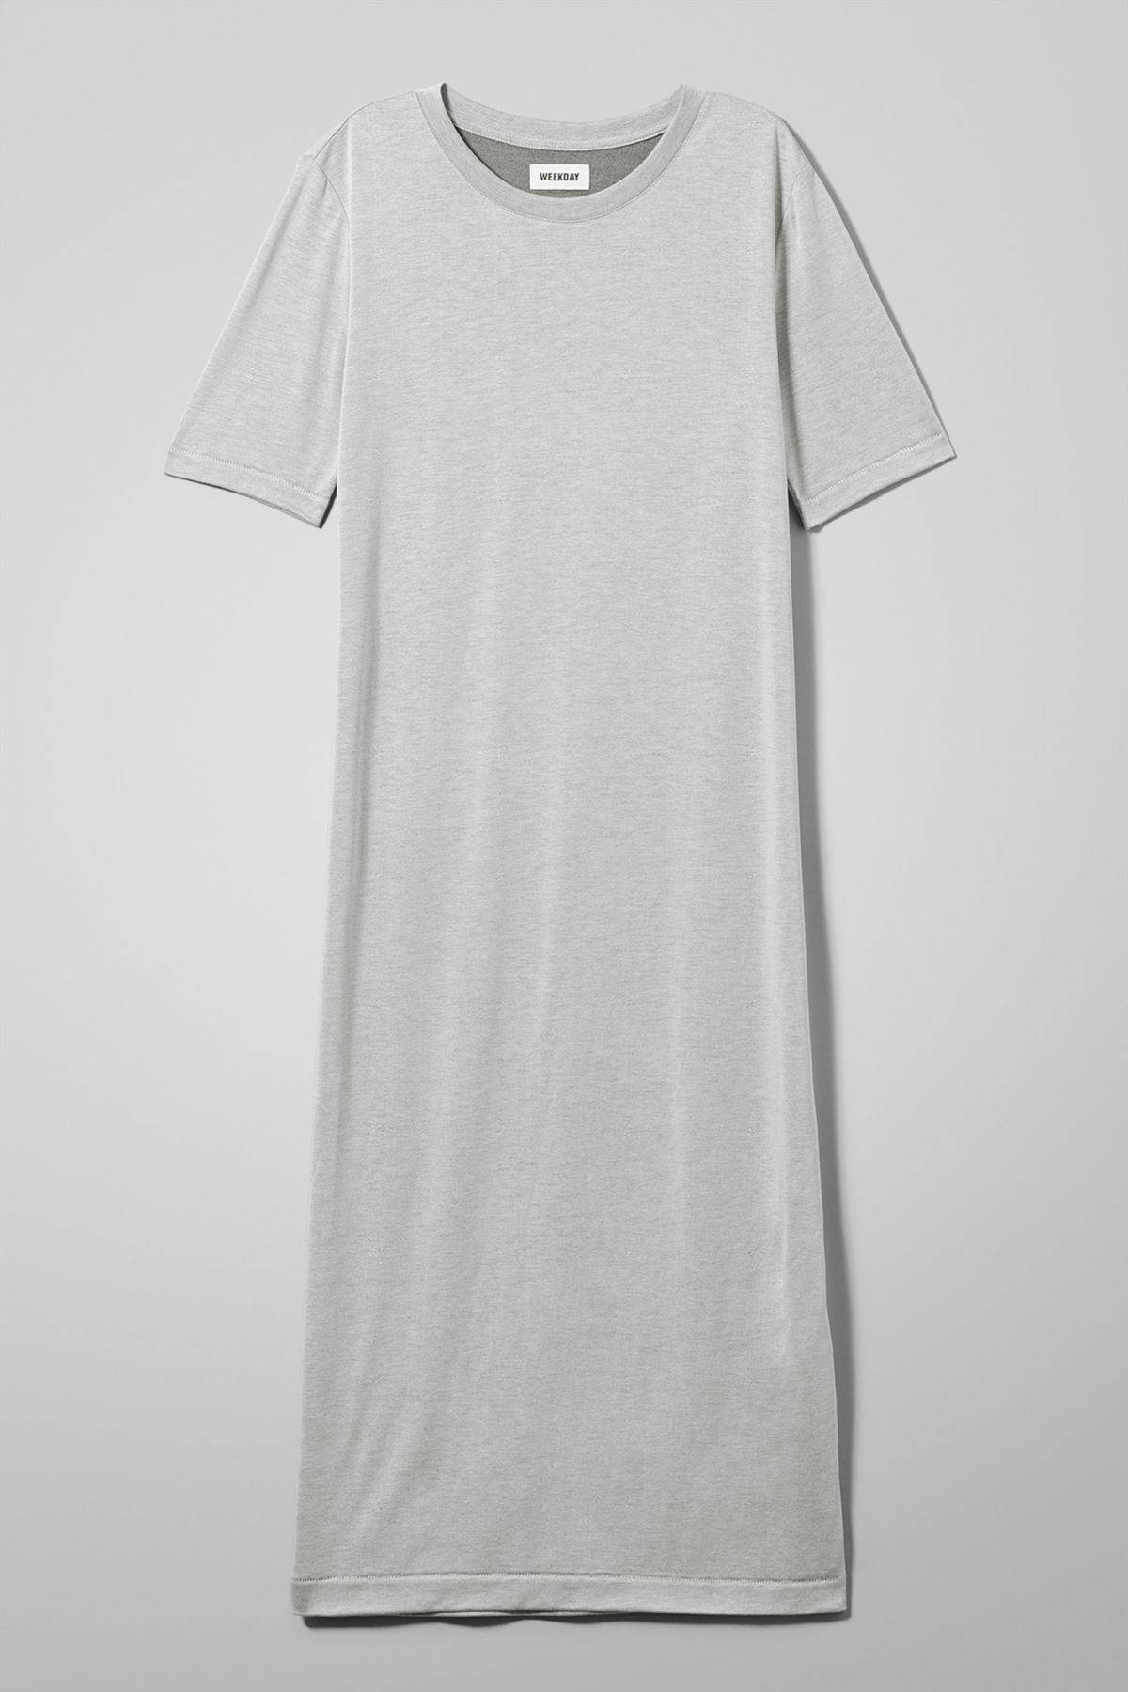 Image of Beyond Dress - Grey-XS